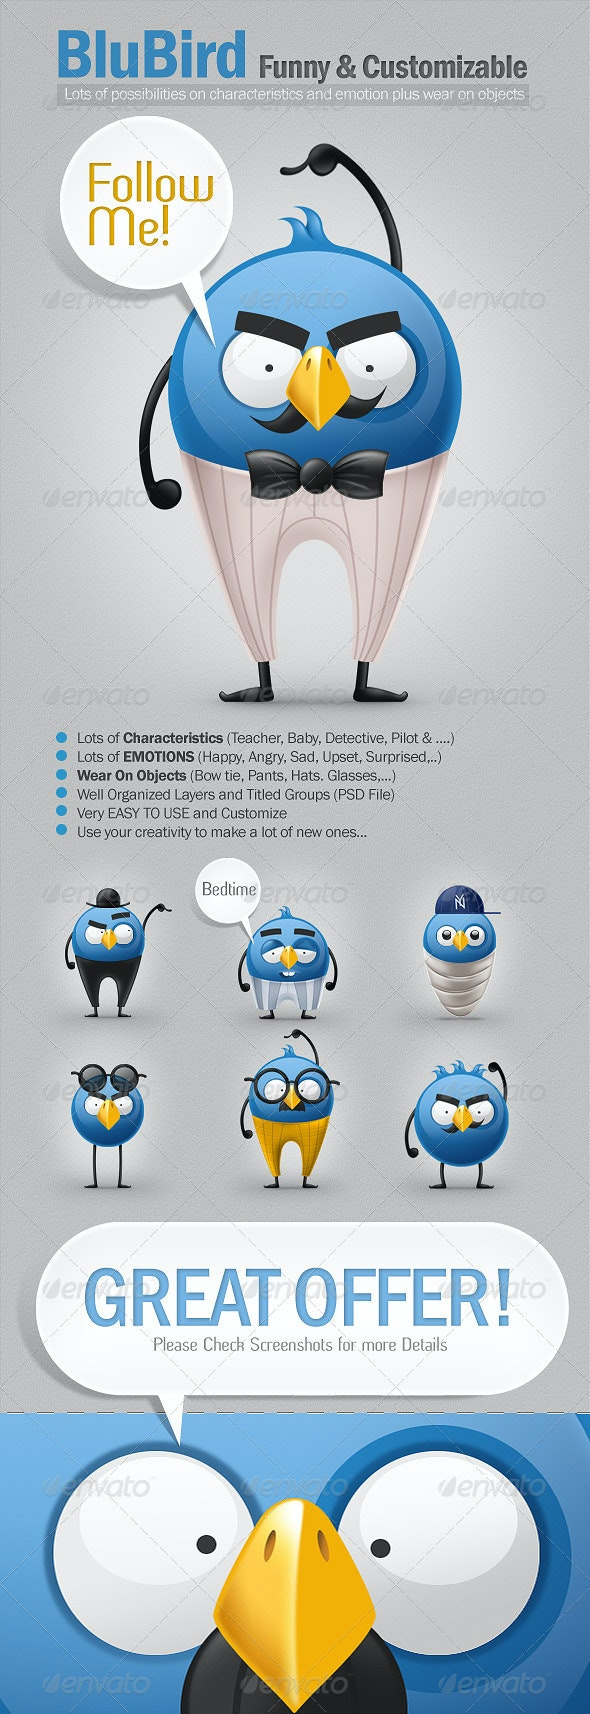 BluBird - Characters Illustrations